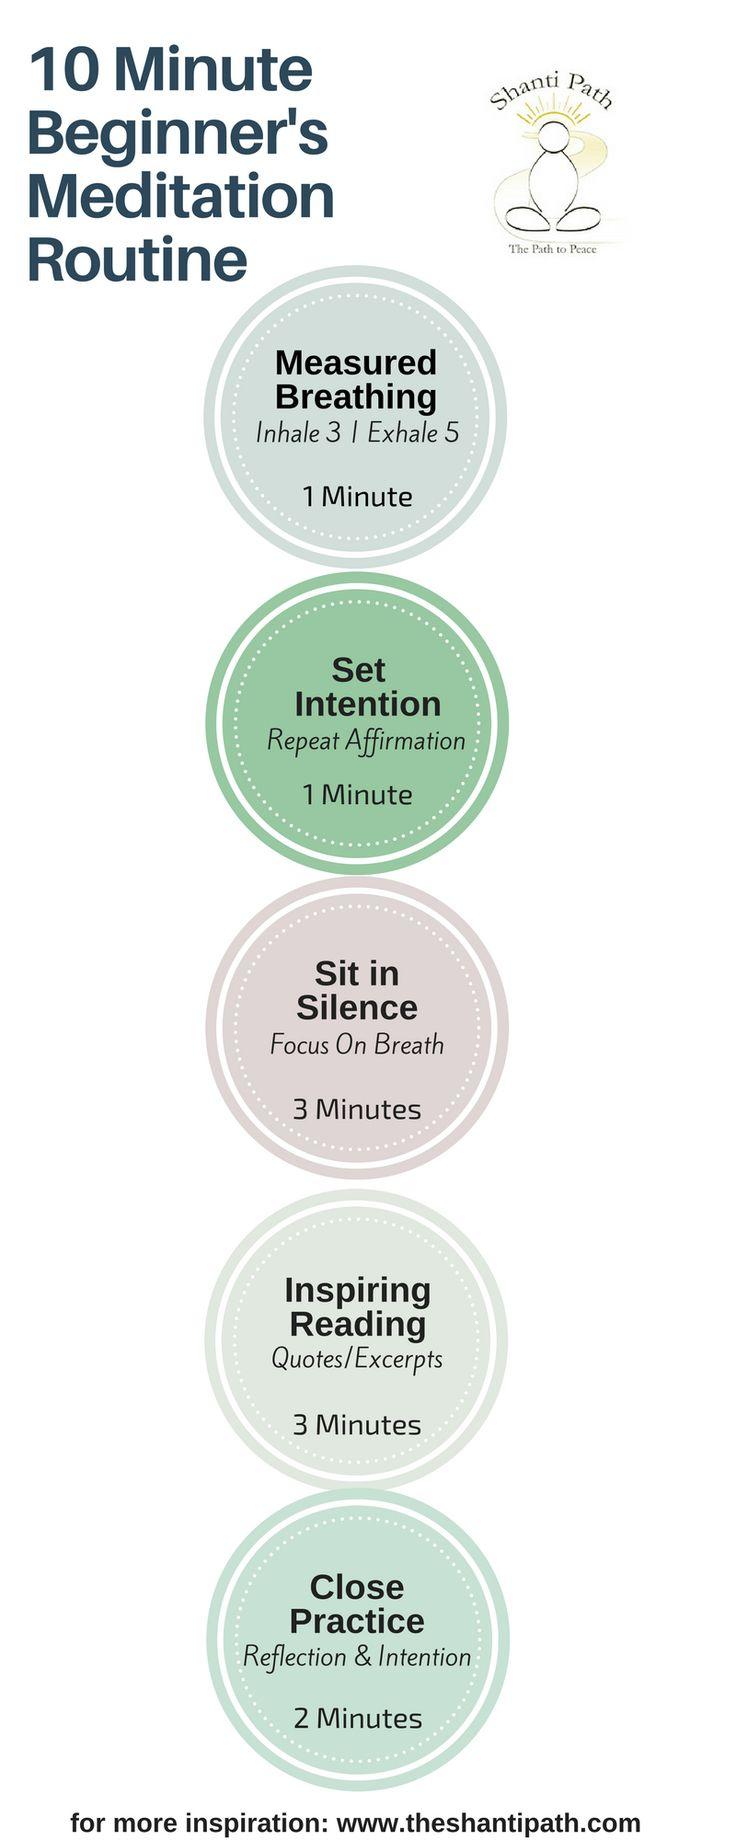 10 Minute Beginner's Meditation Routine | theshantipath.com